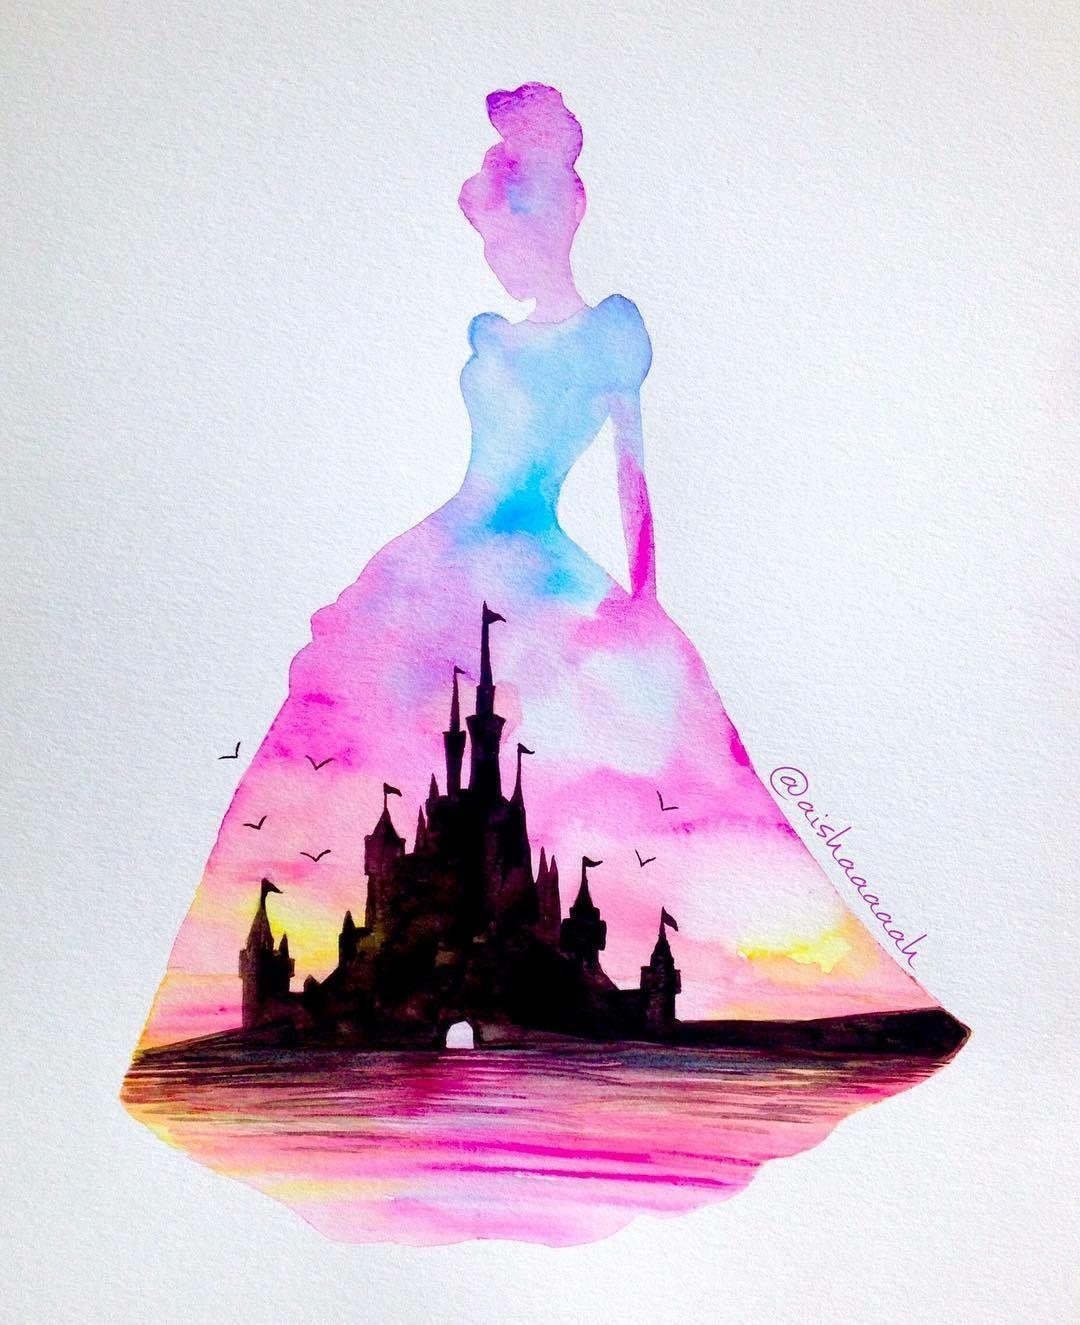 1080x1325 Cinderella Wallpapers Pinterest Disney Art Princess And